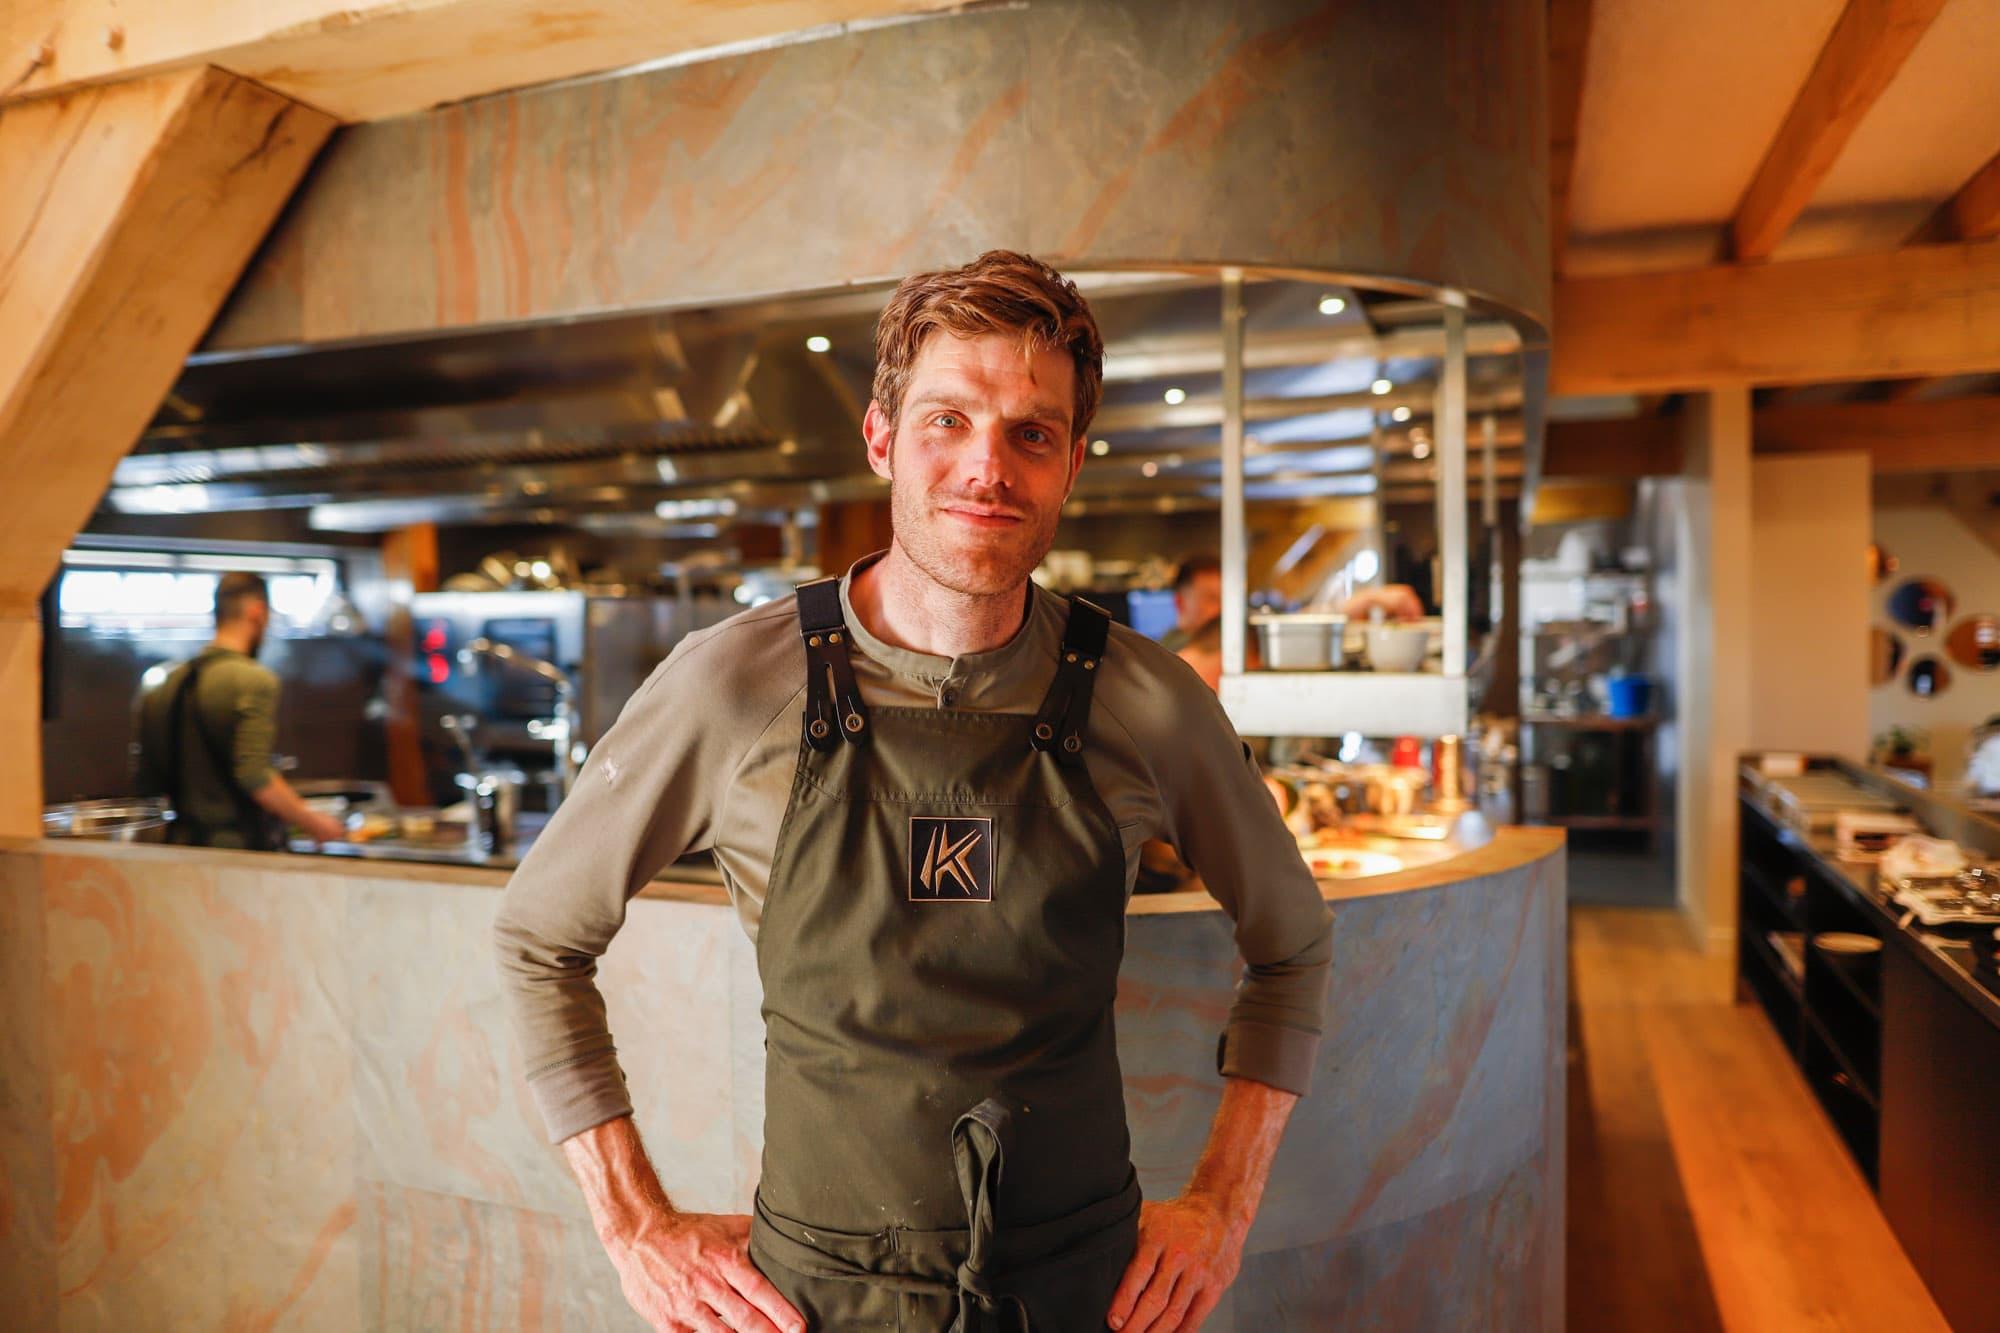 Chef-kok Jos Keijsper portret